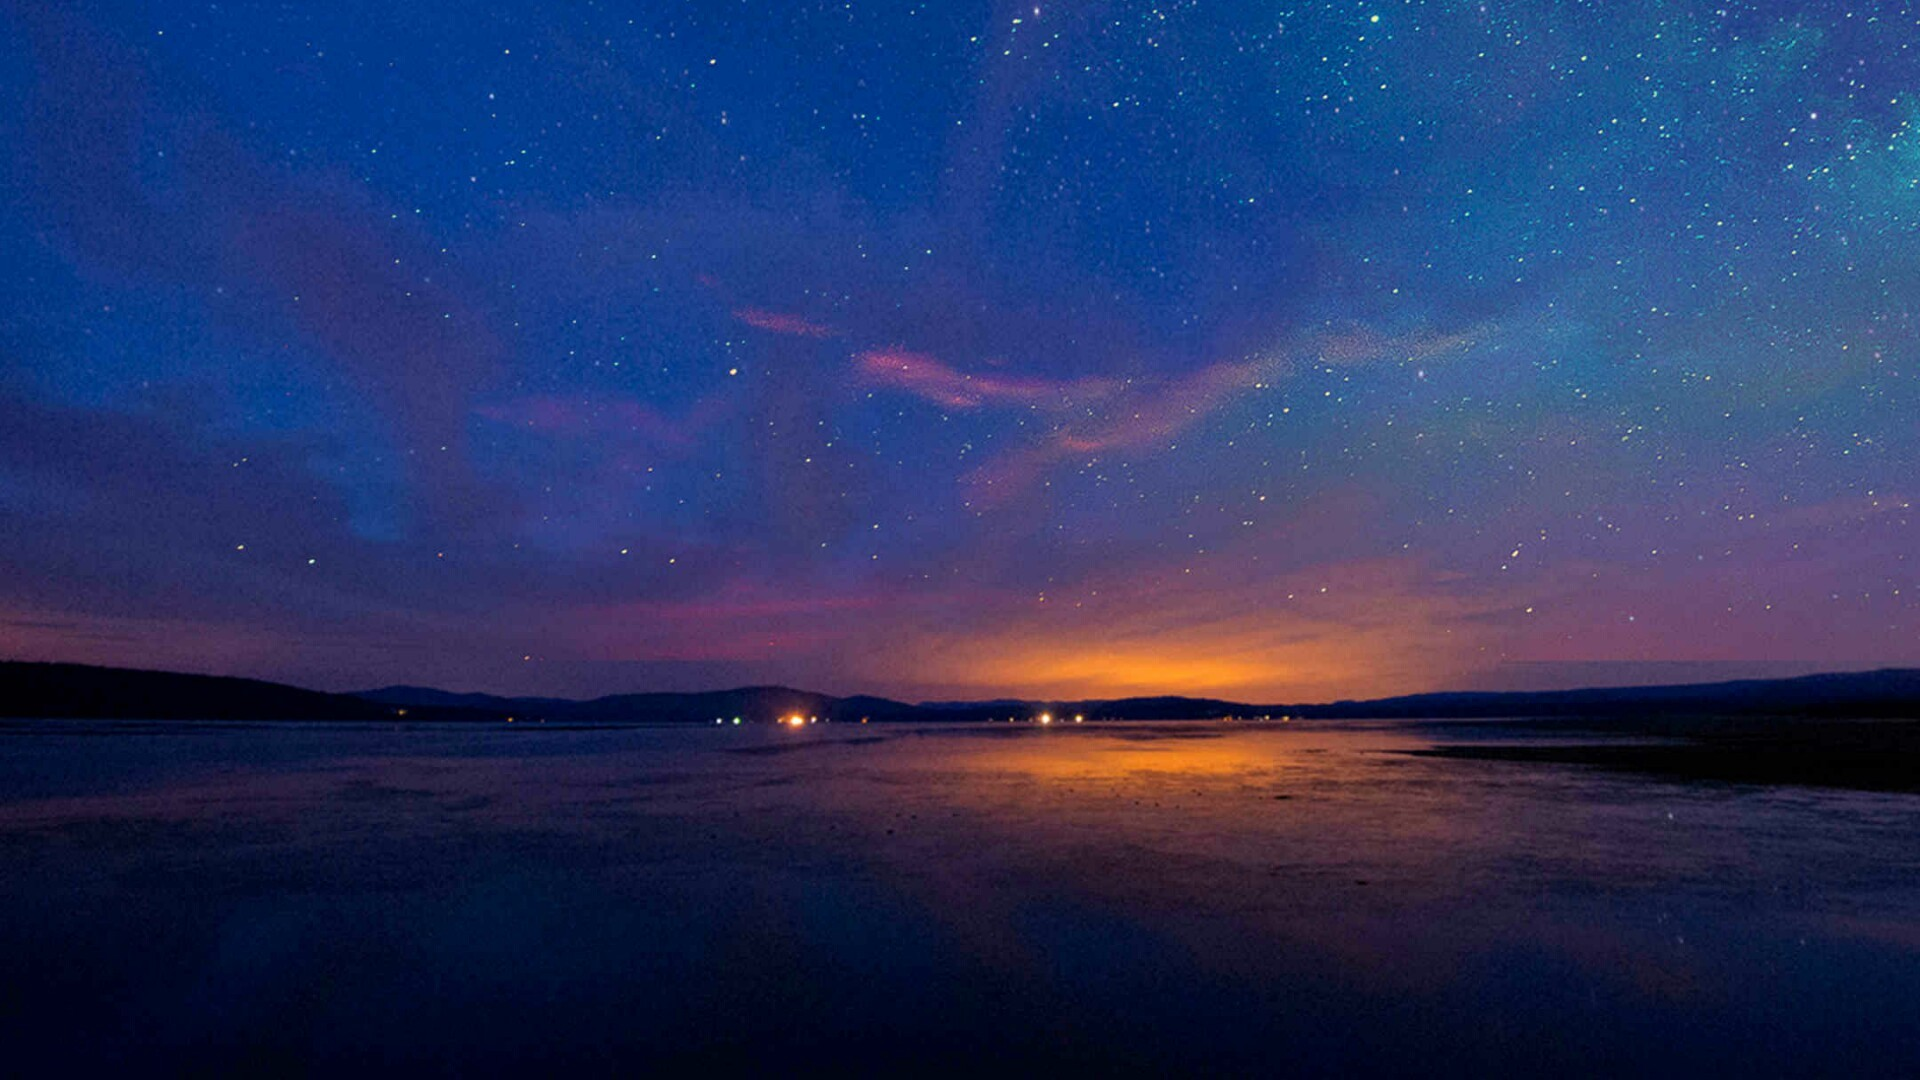 Fall Stars Wallpaper Starry Night Sky Wallpaper 183 ①